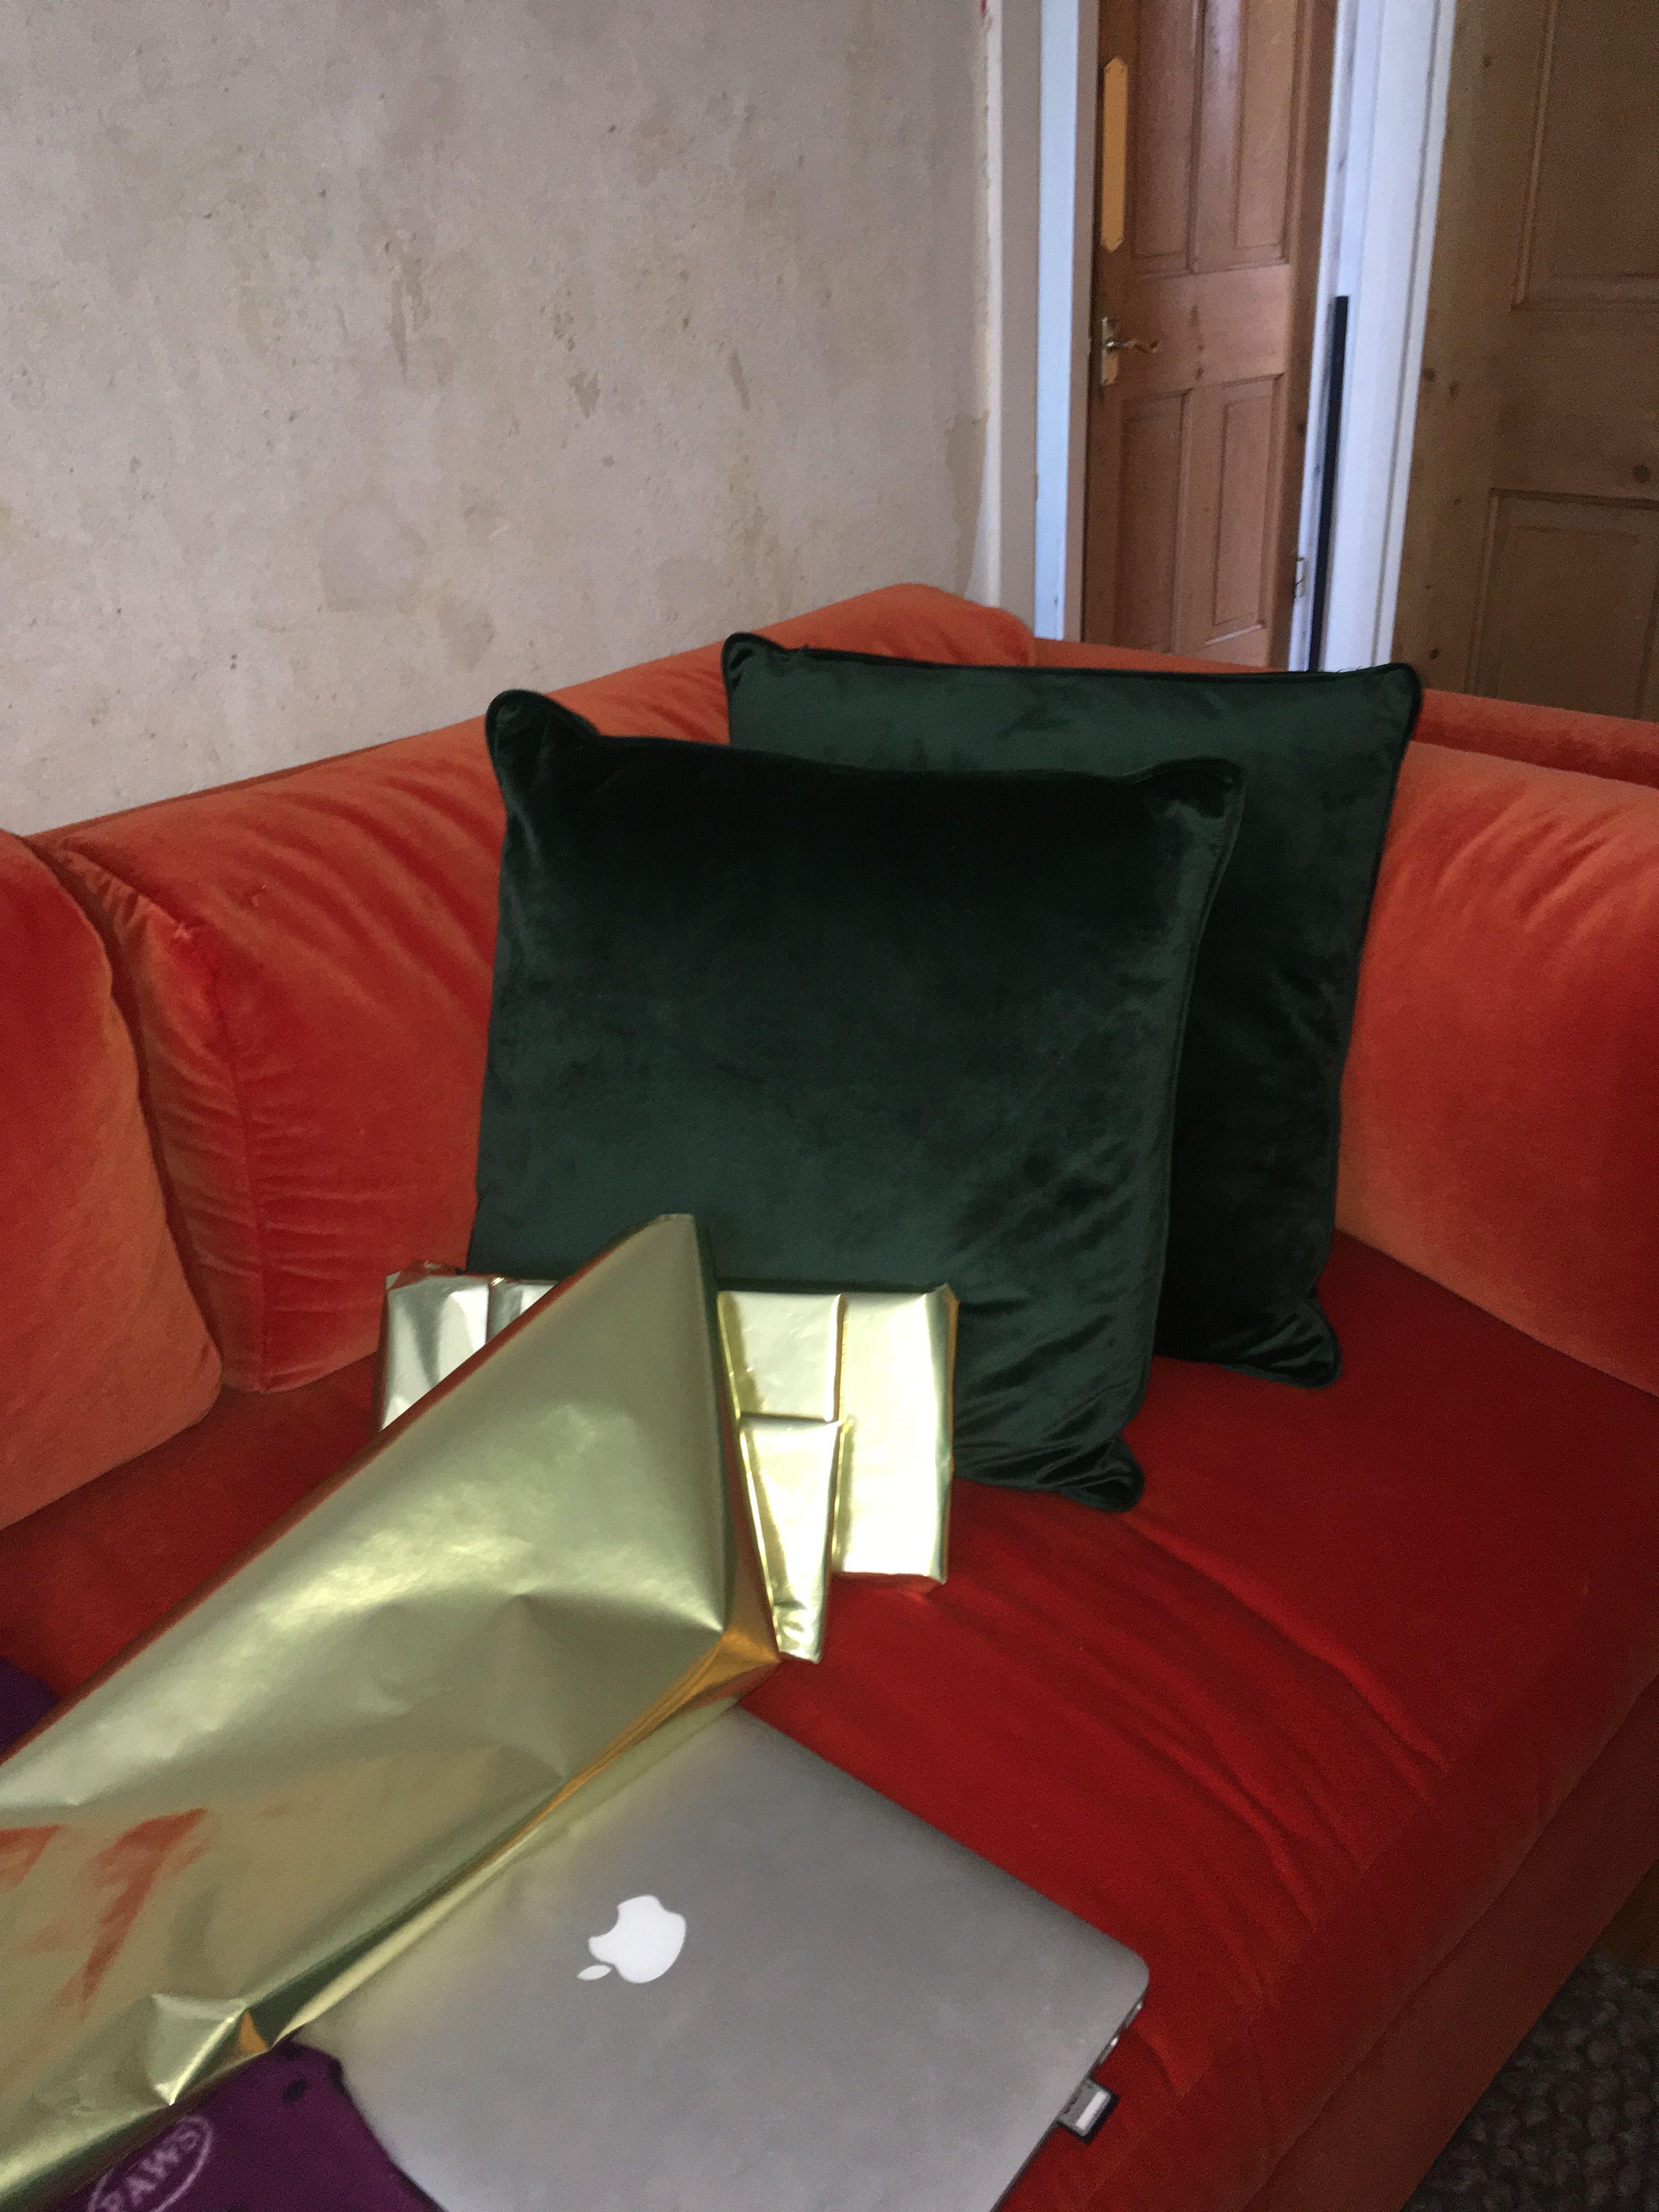 Hay Sofa Kvadrat Boconcept Osaka Original Hackney Burnt Orange Velvet Fabric Sample 3 Seater Comfy Dark Green 1940s Red And Macbook Home Decor